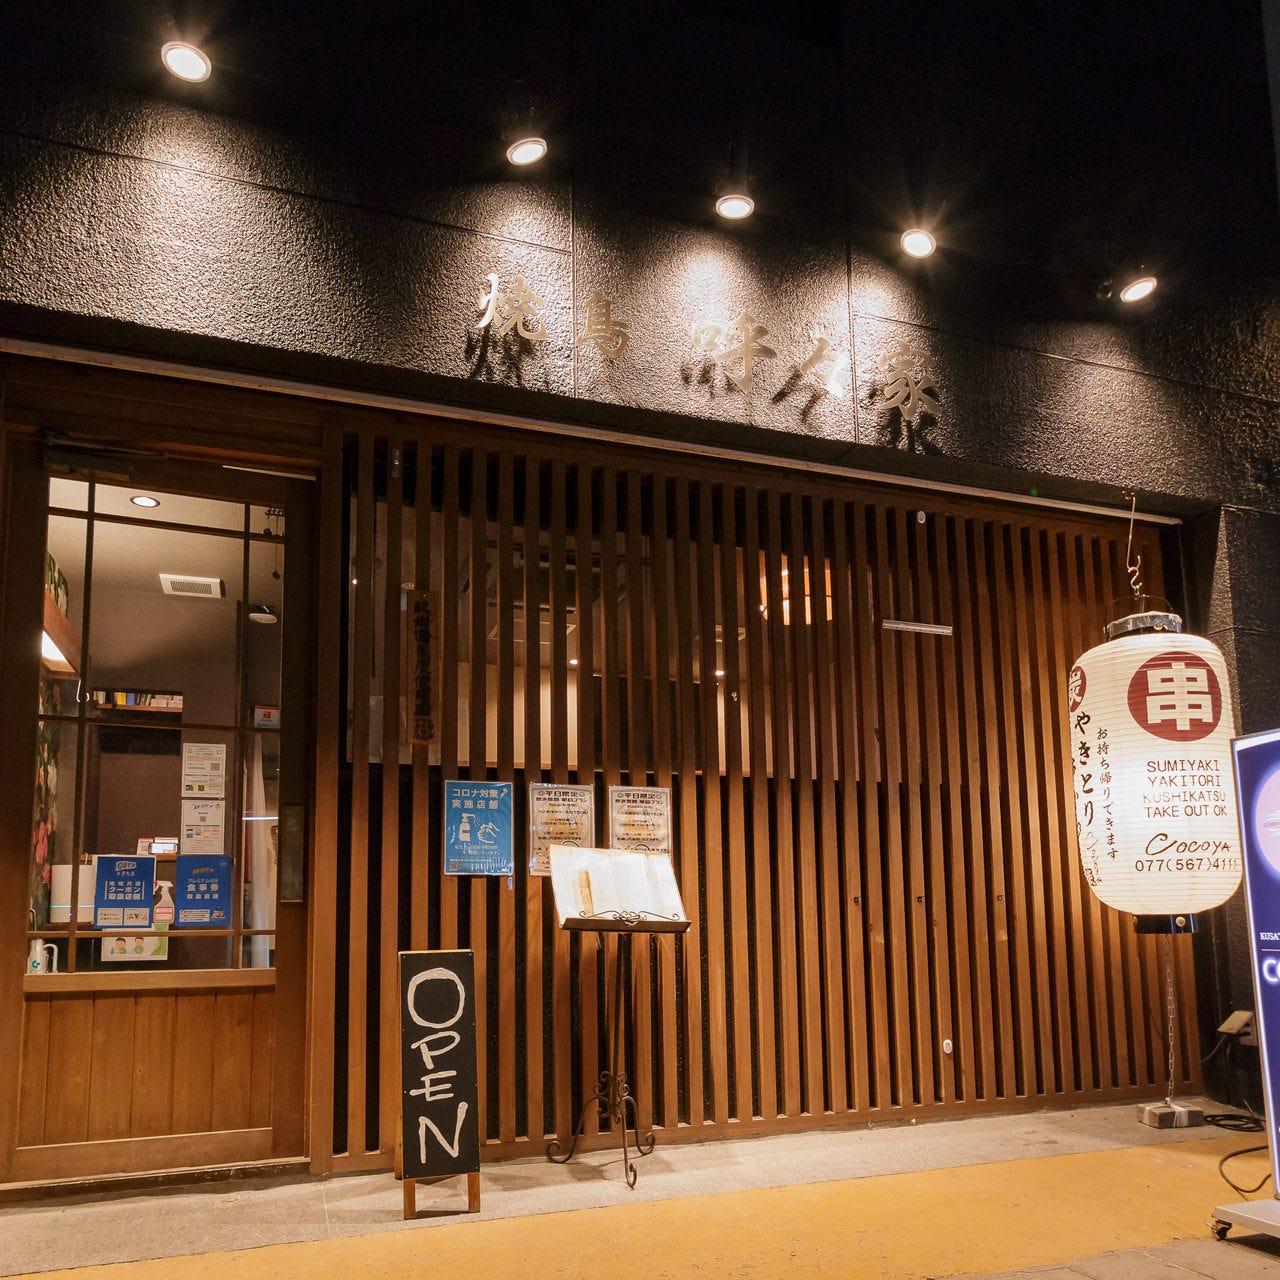 JR 草津駅東口徒歩3分と駅からも近くてお集まりにも便利♪